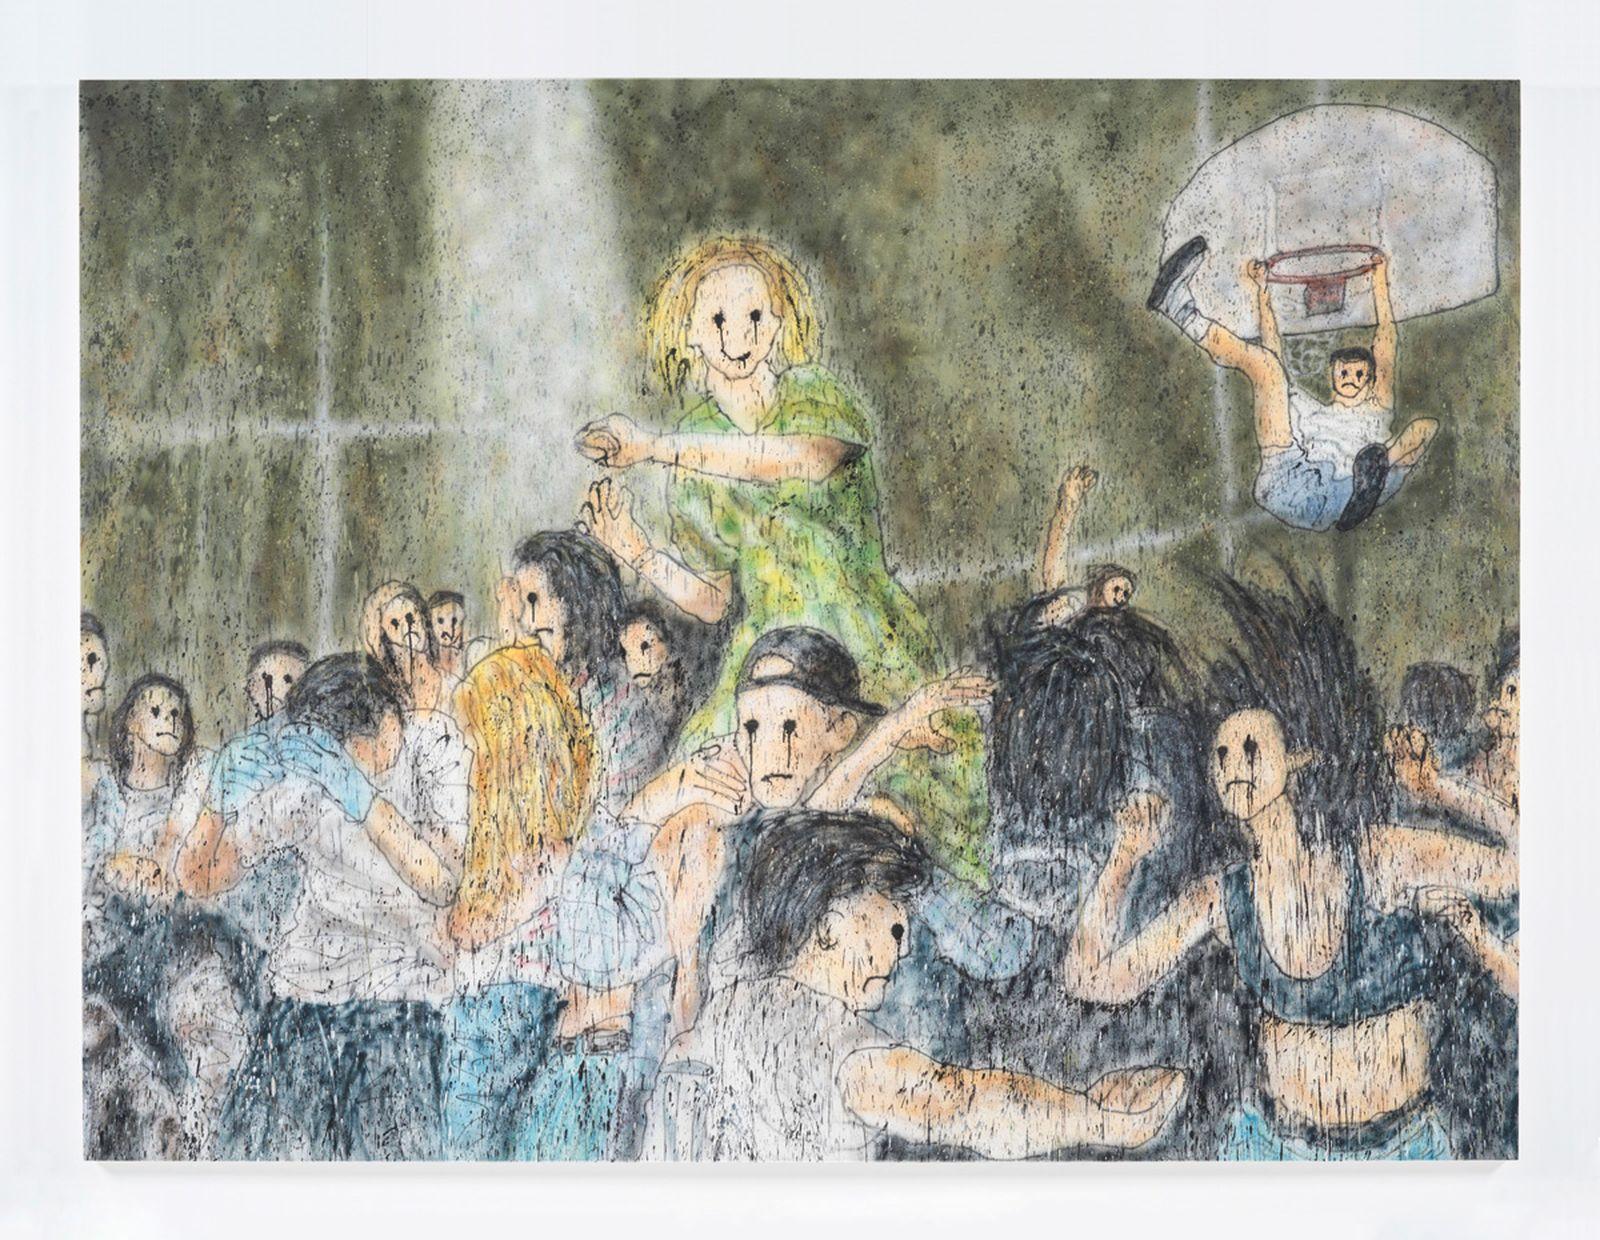 Untitled, 2021 Acrylic paint, aerosol on canvas 230 x 306 cm.